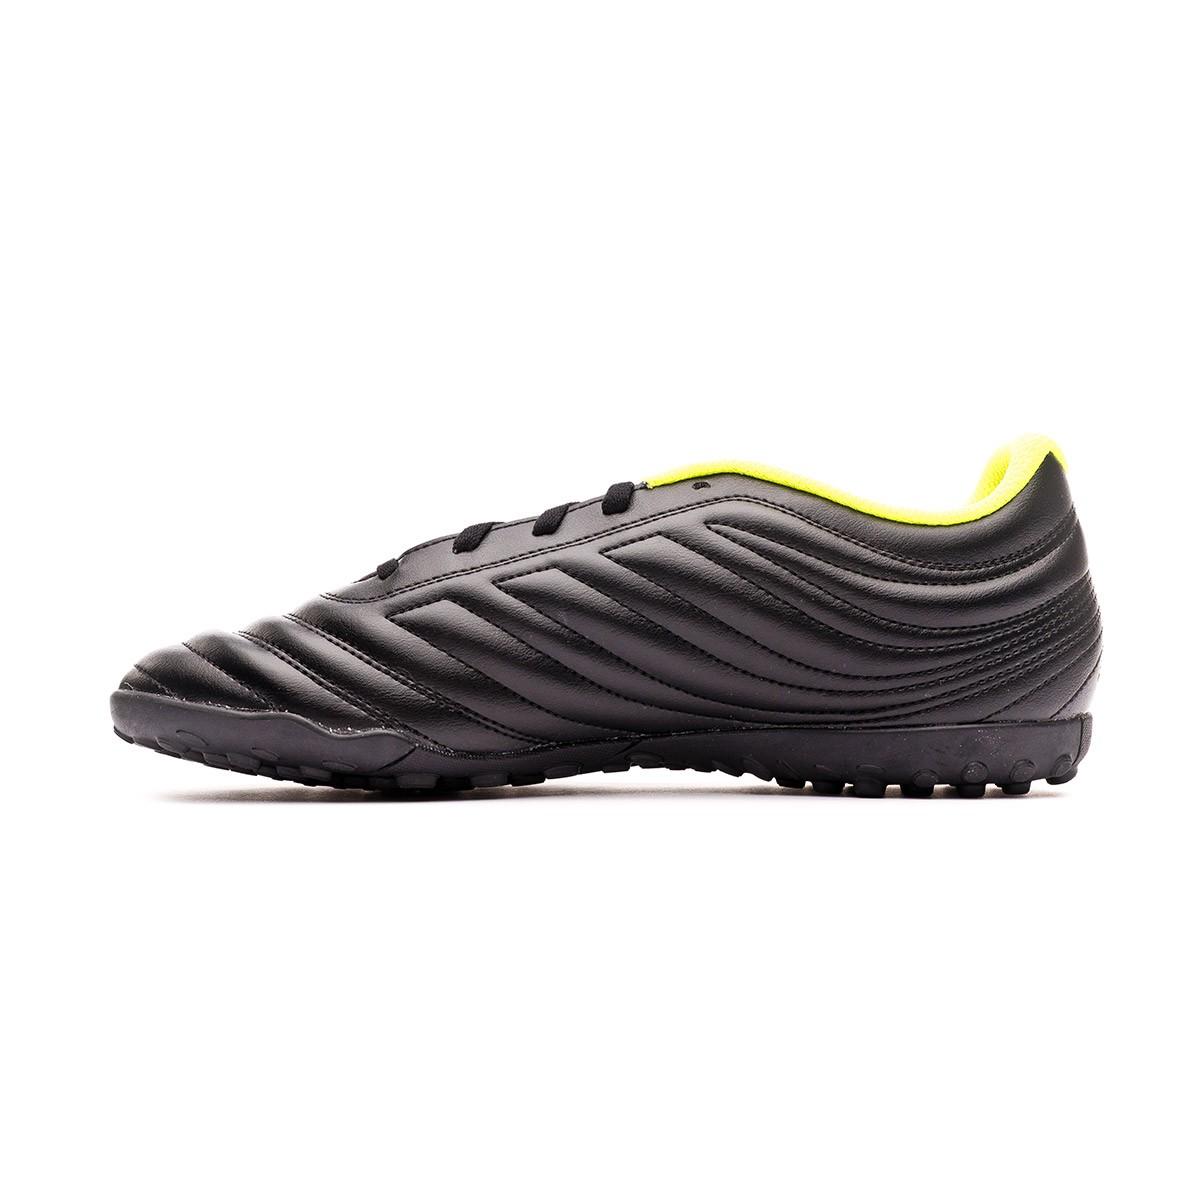 0cfd51c3b2d Football Boot adidas Copa 19.4 Turf Core black-Solar yellow-Core black -  Football store Fútbol Emotion